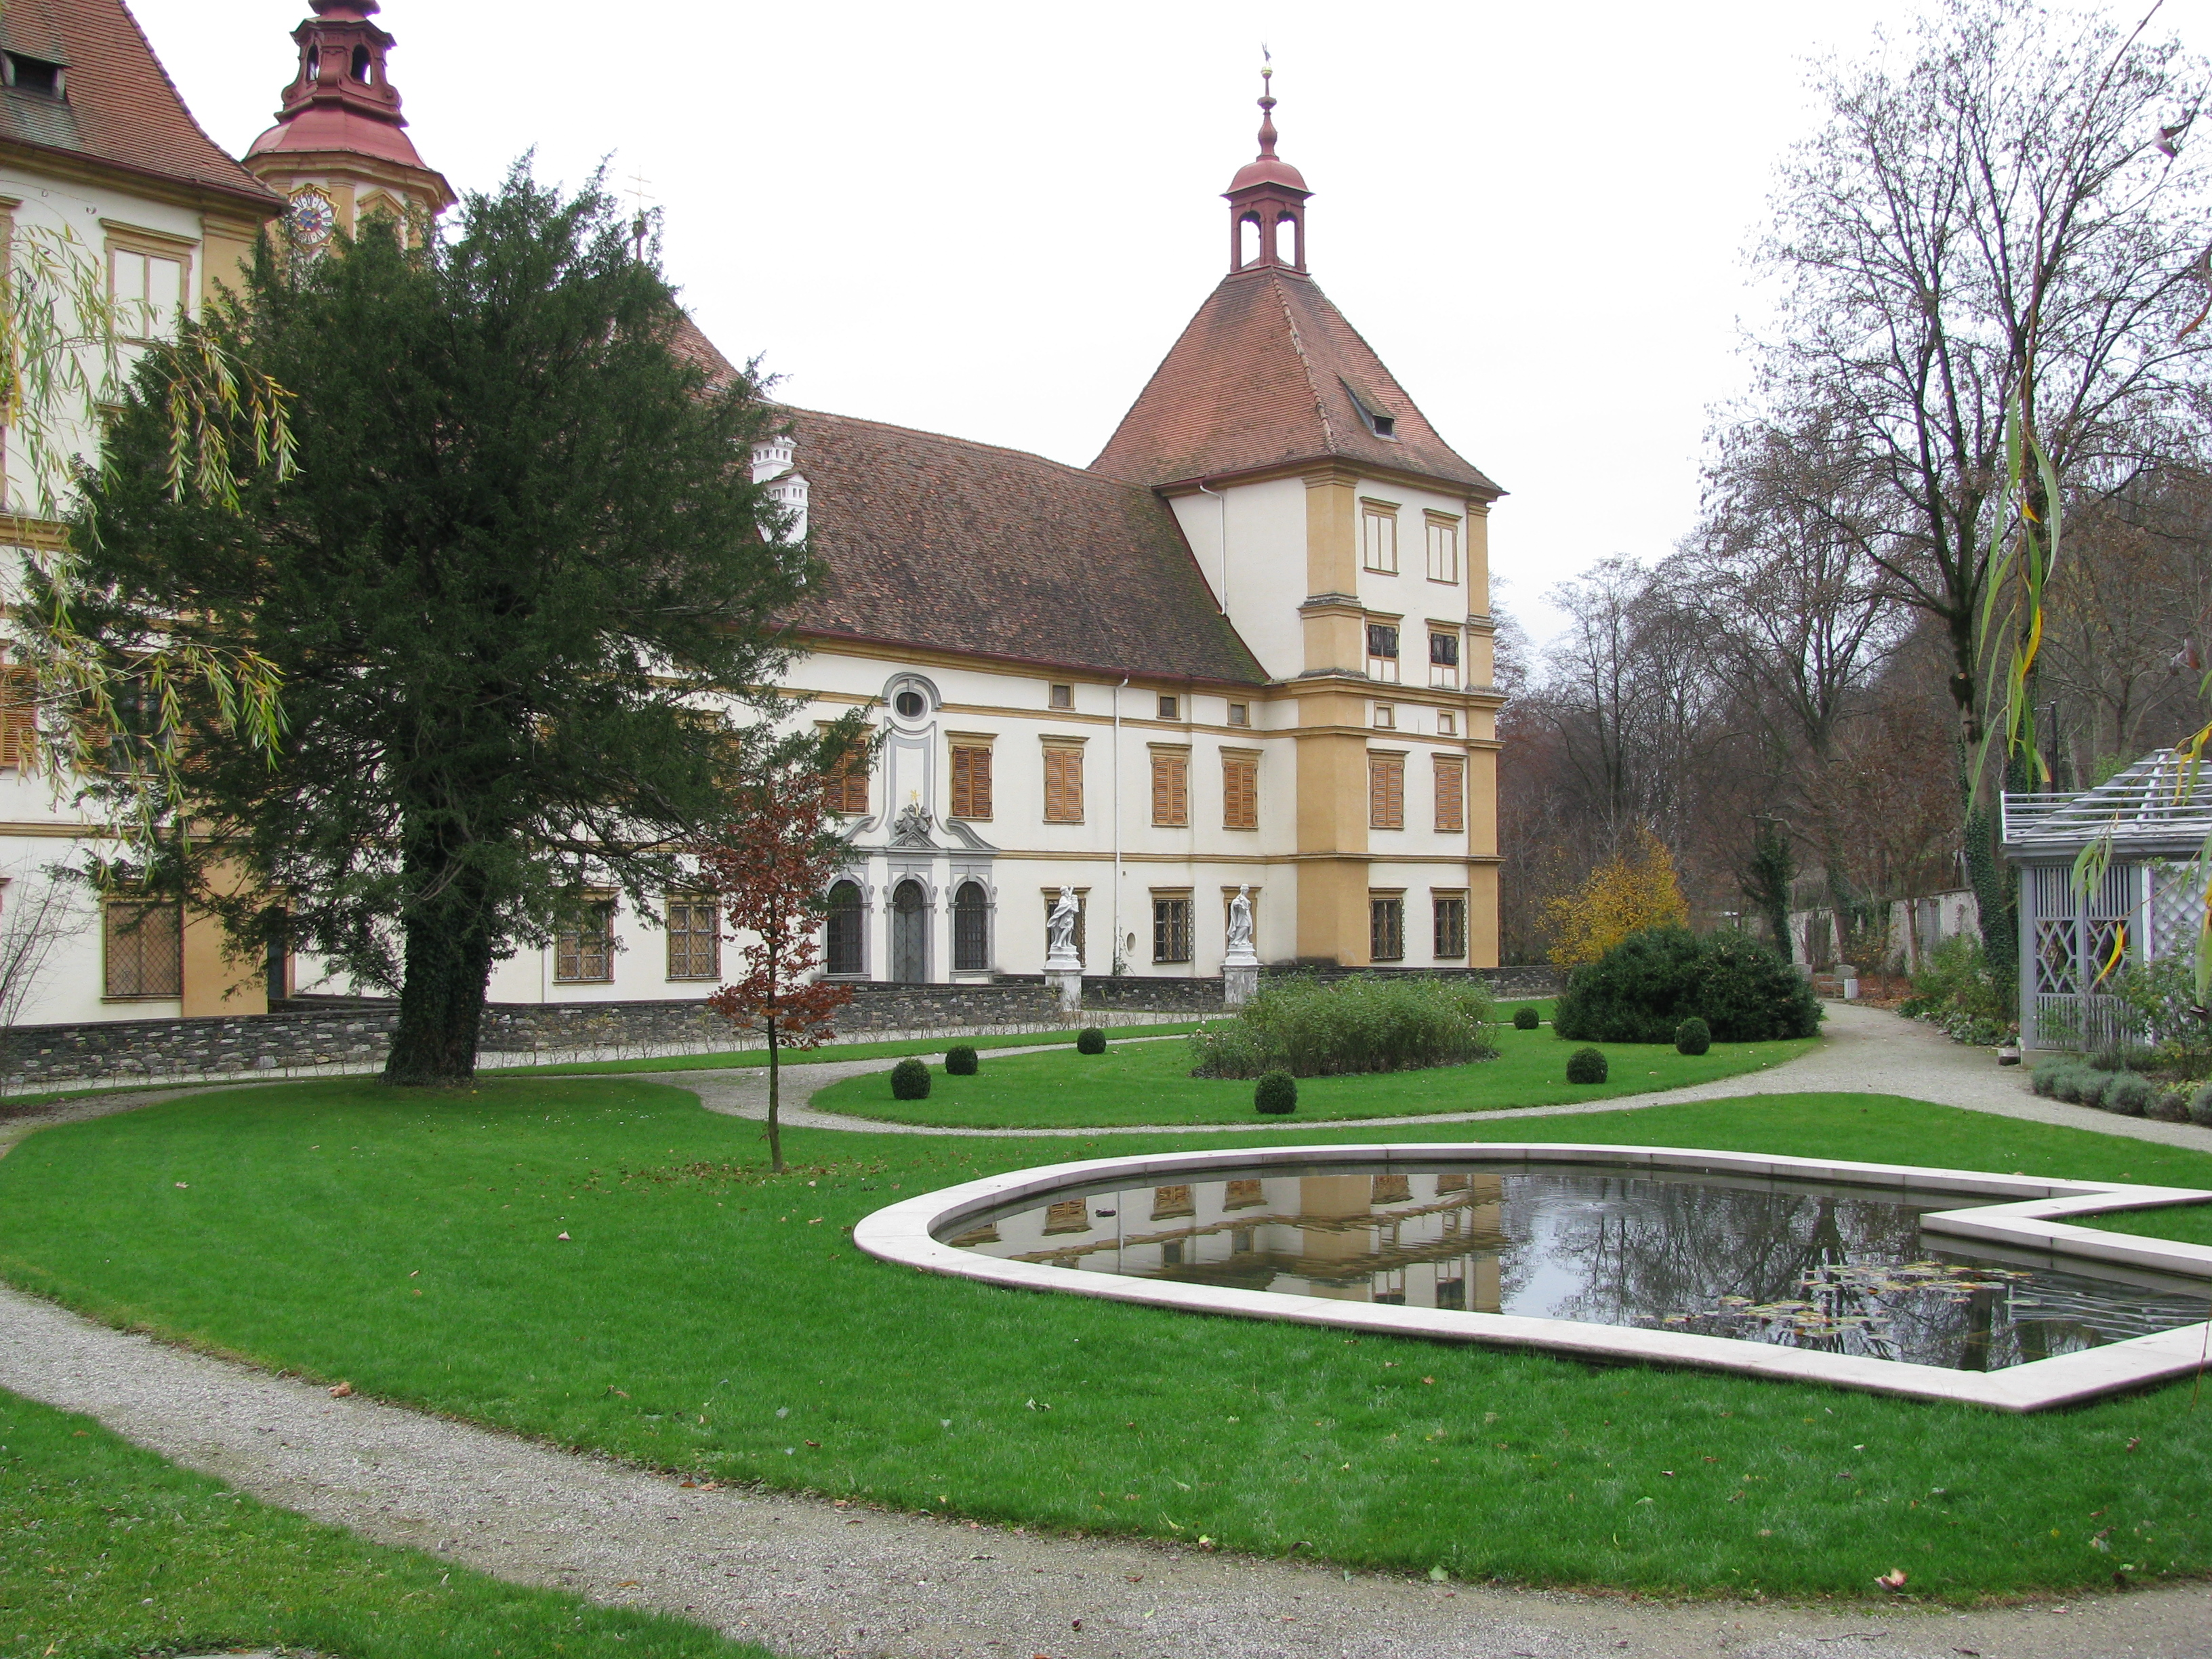 bekanntschaften graz steiermark Tübingen